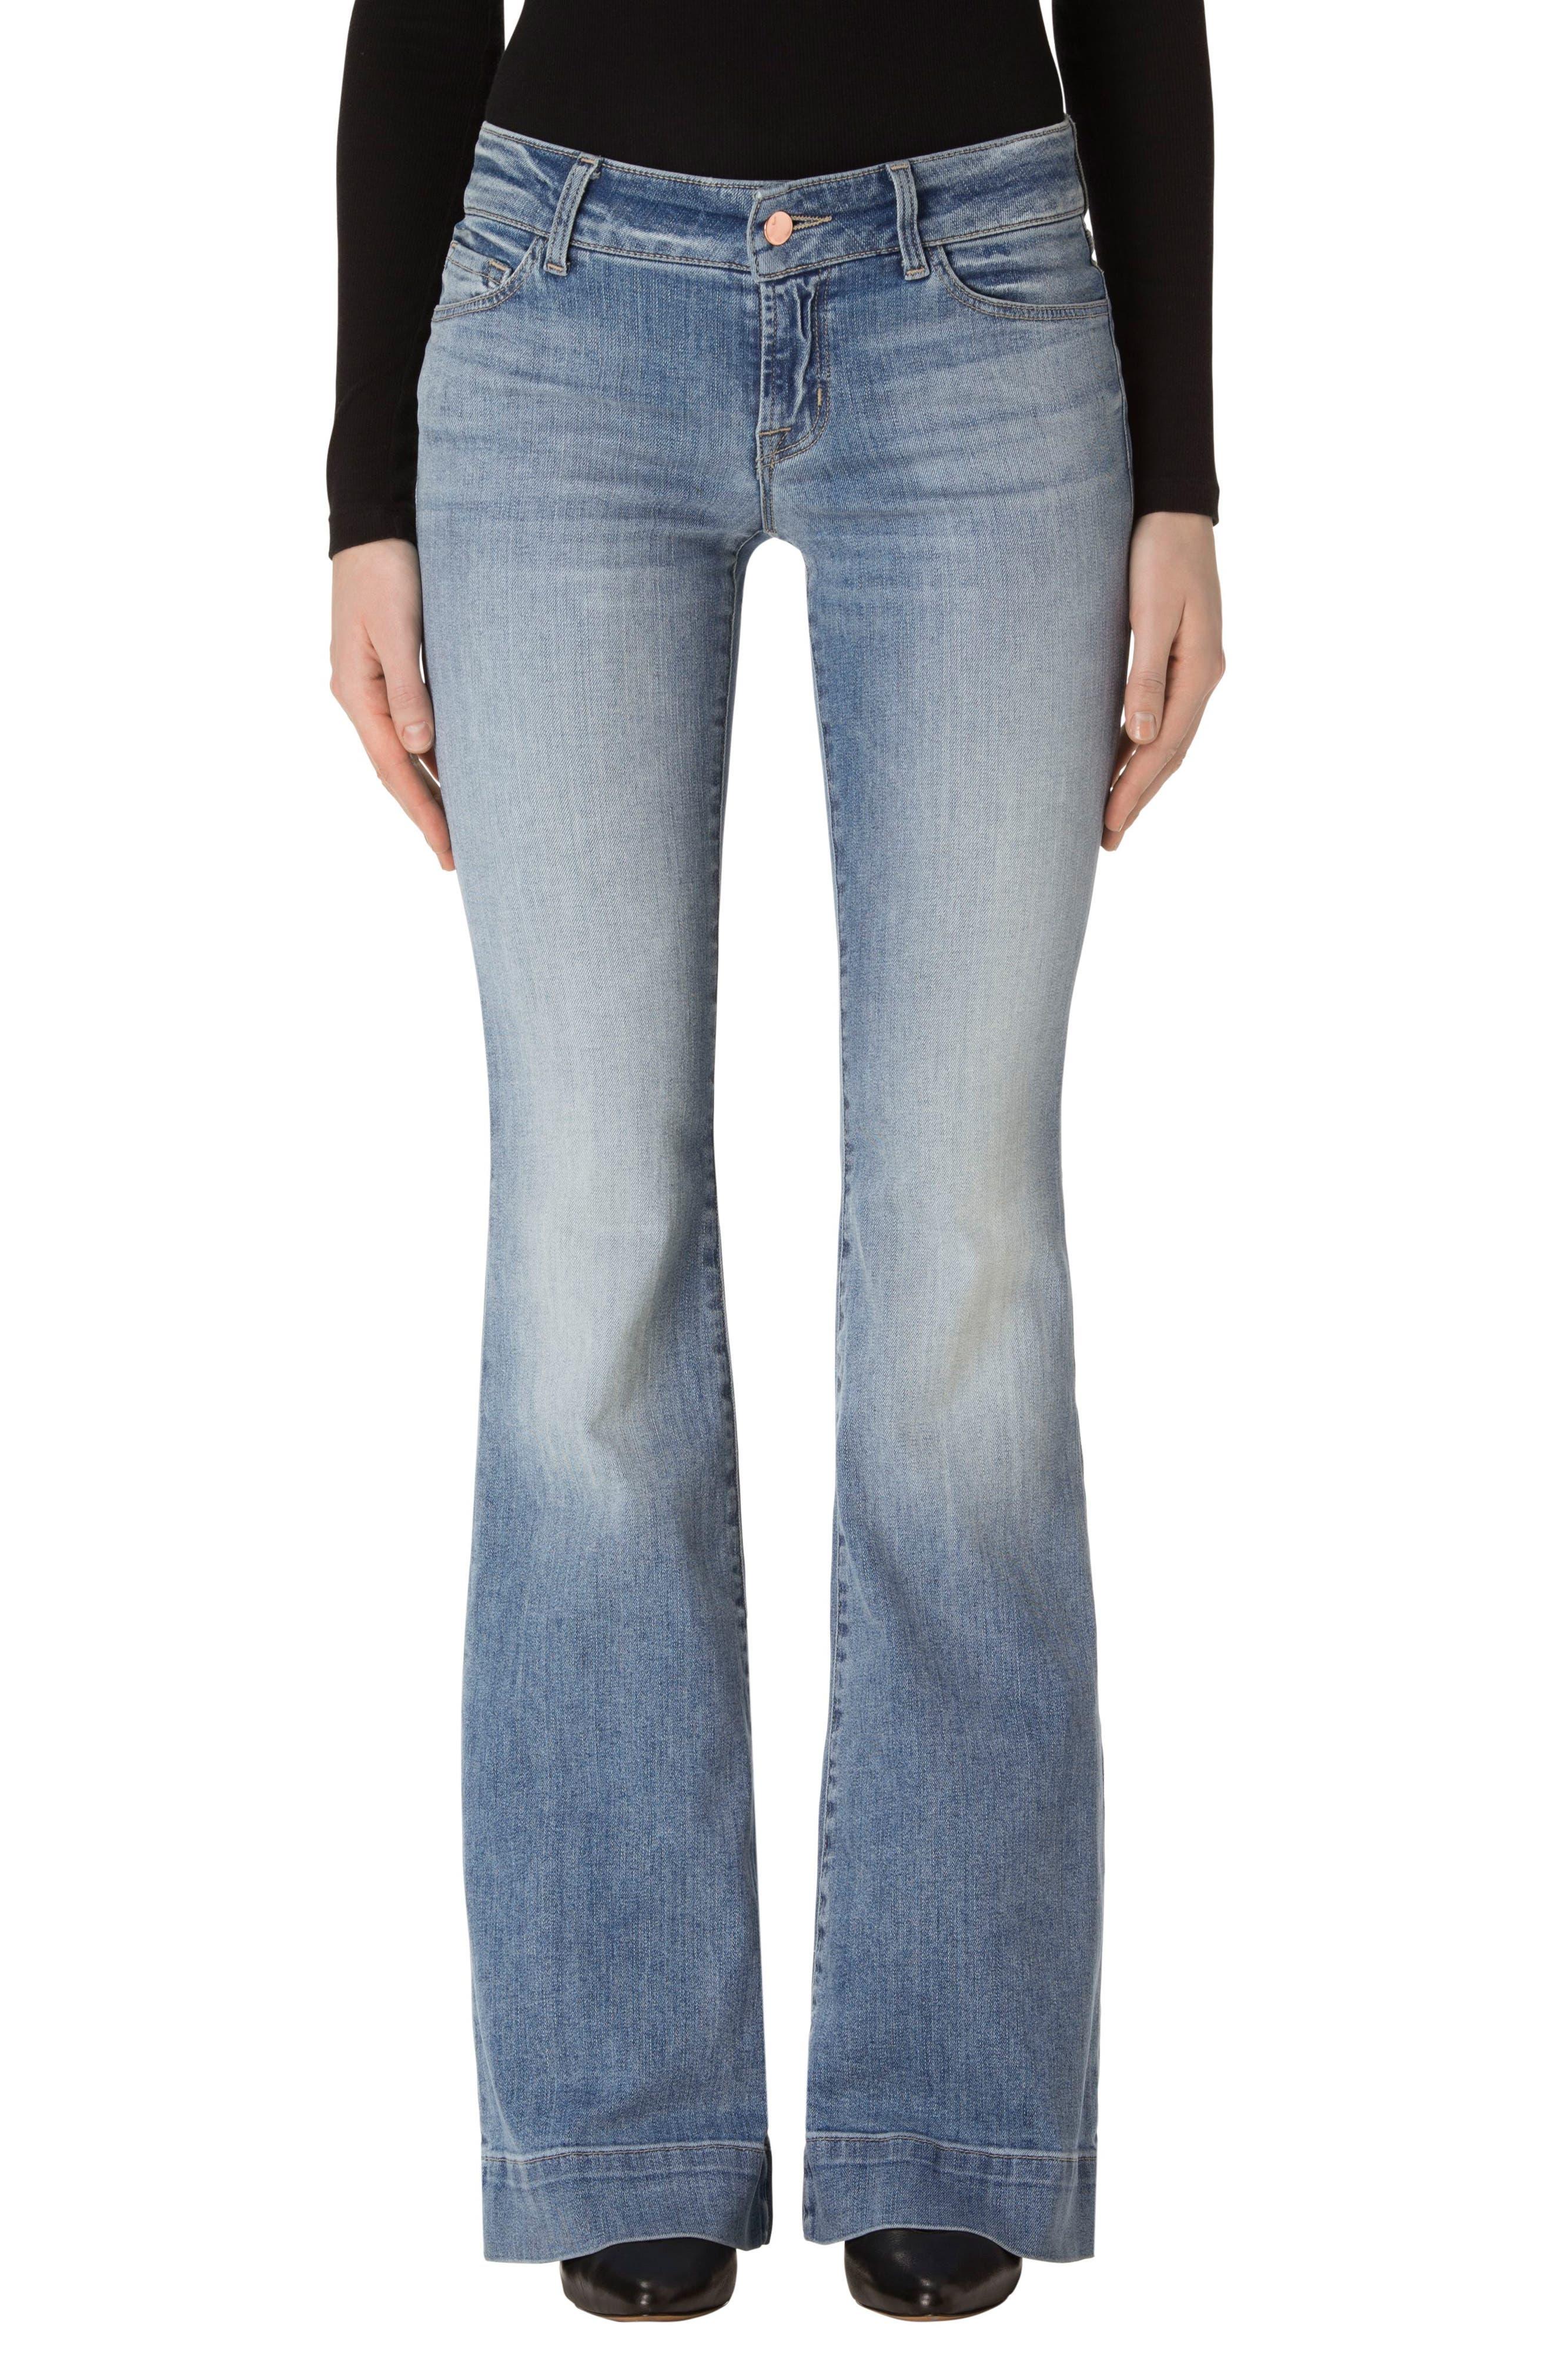 J Brand Love Story Flare Jeans (Adventure)